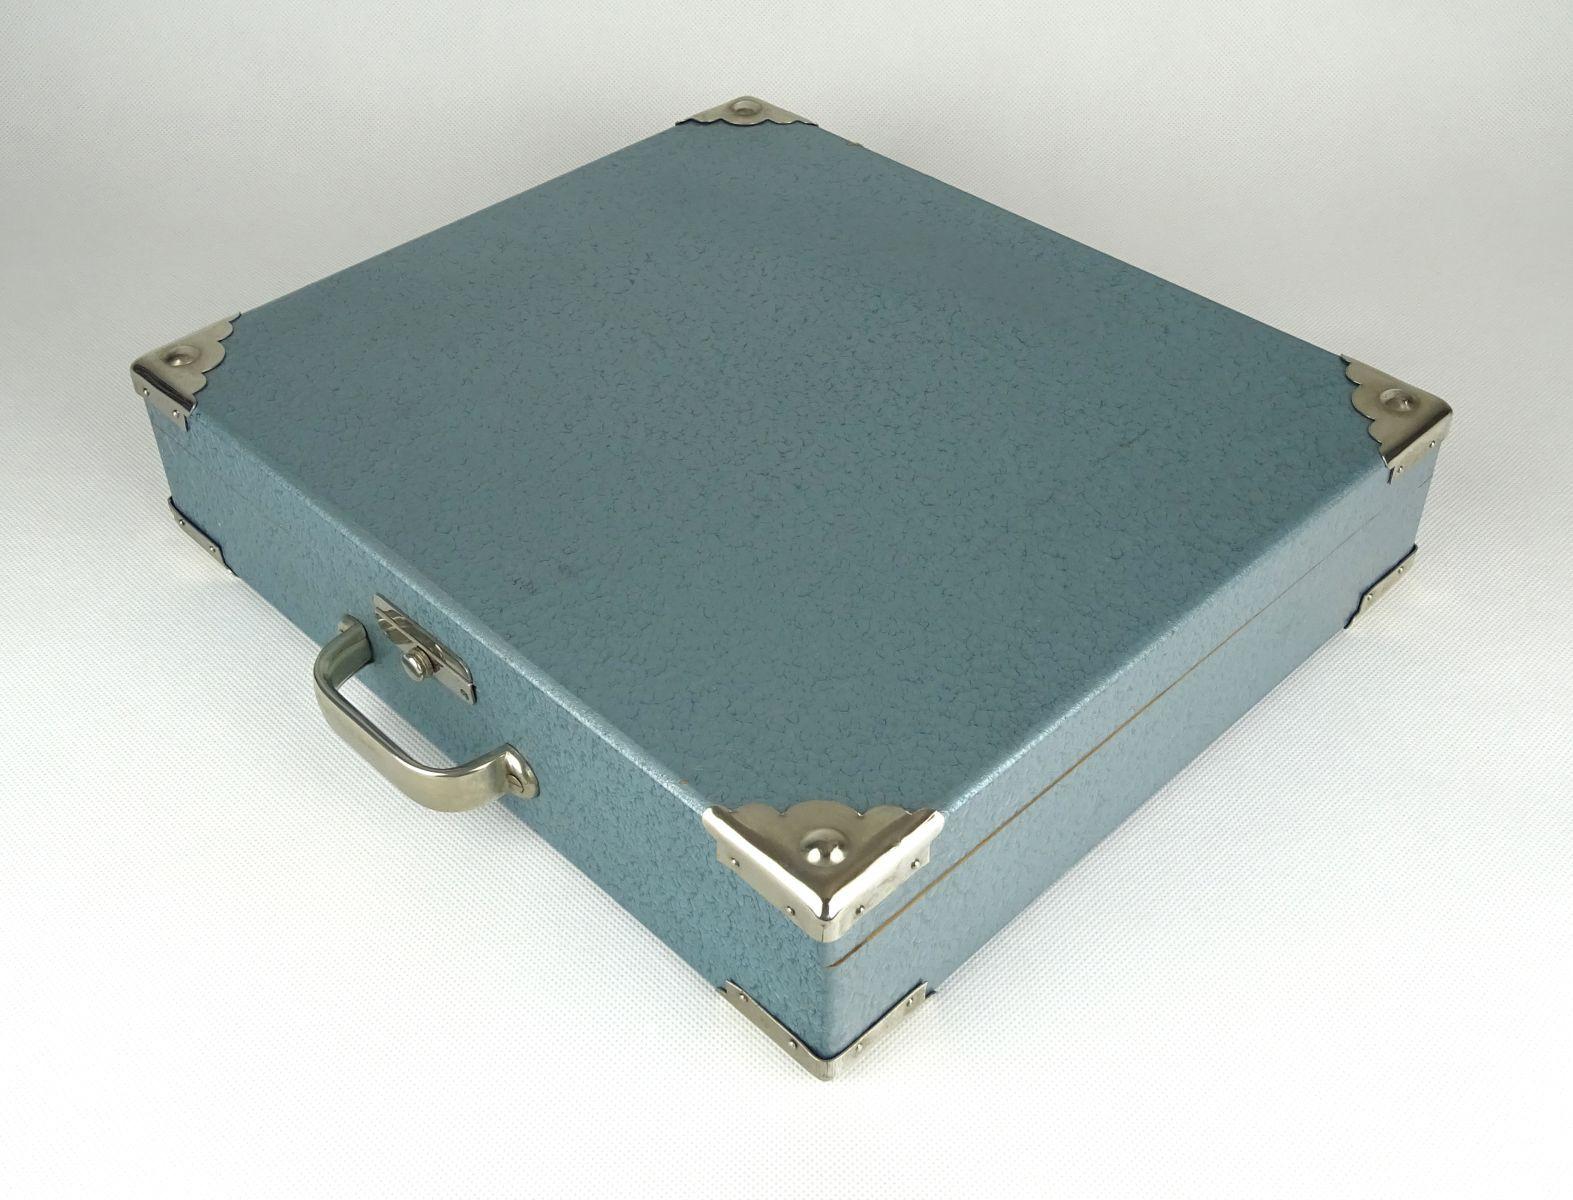 DSC03560.JPG (1573×1200)